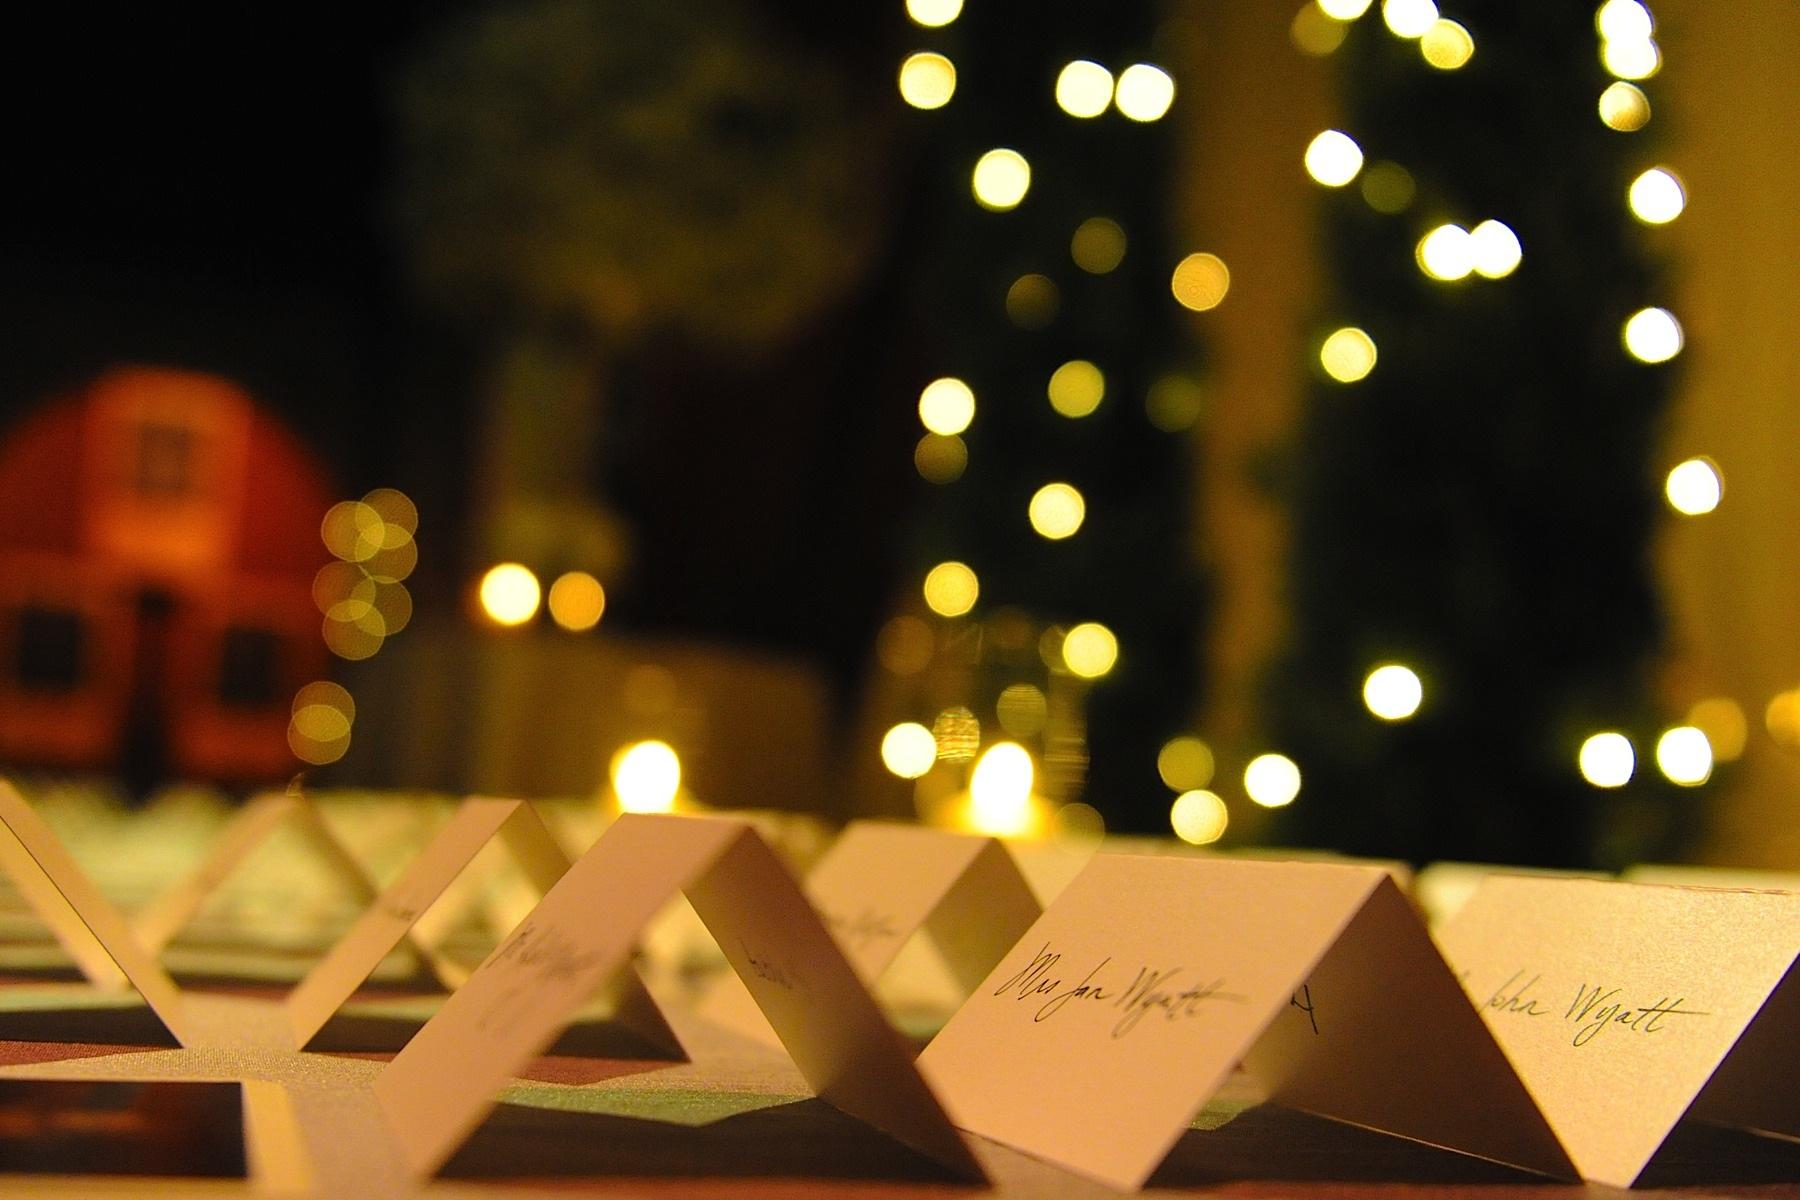 culinary_institute_of_america_napa_valley_wedding_074photographer_